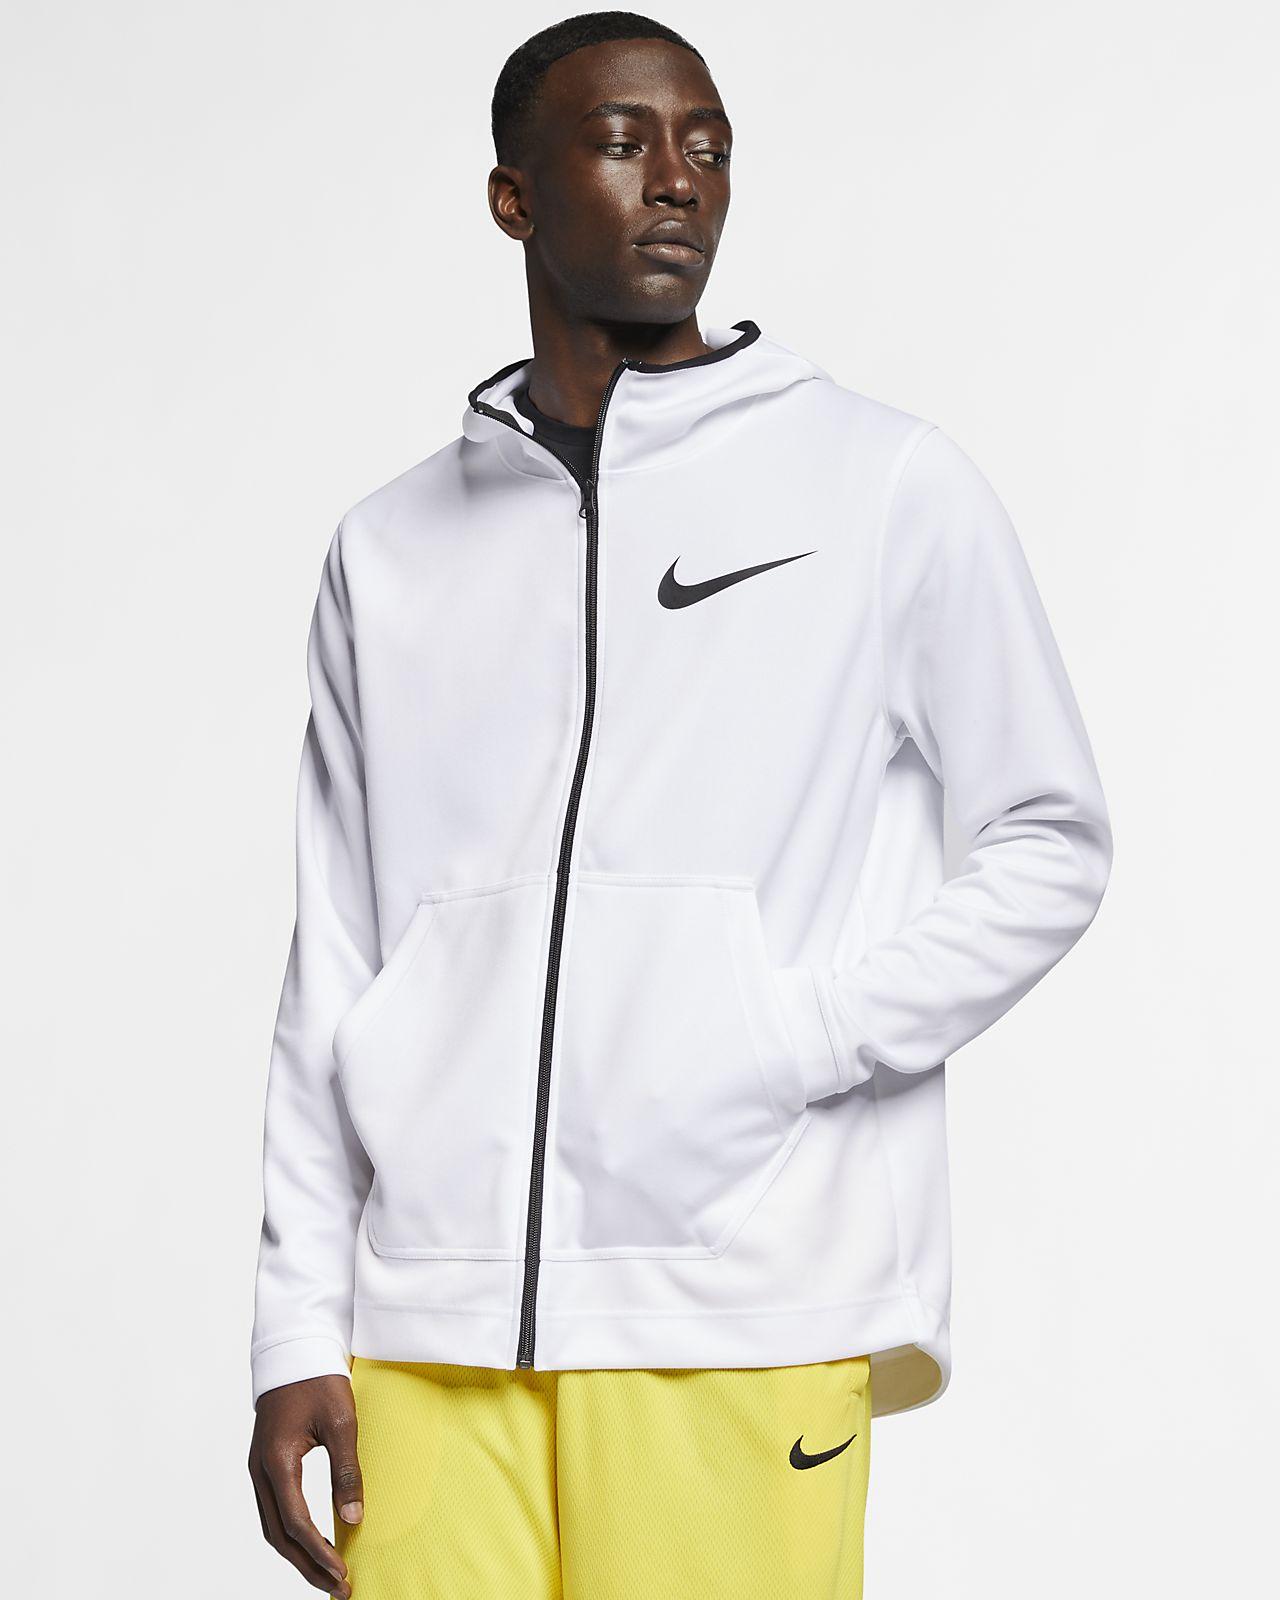 Nike Spotlight Men's Basketball Hoodie